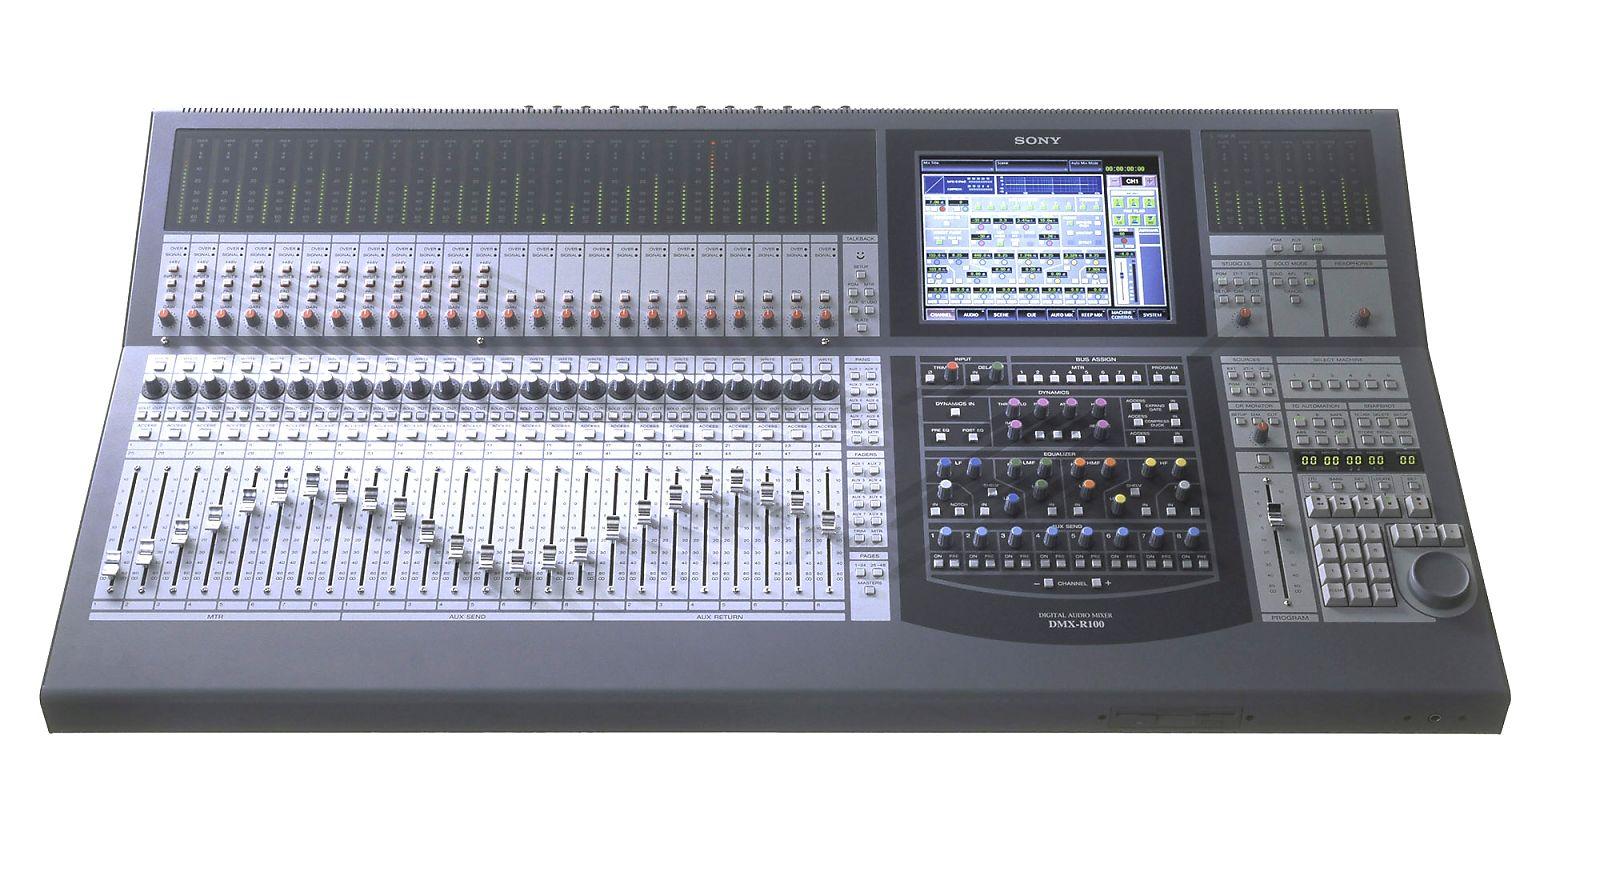 sony dmx r100 48 channel digital audio mixer reverb. Black Bedroom Furniture Sets. Home Design Ideas